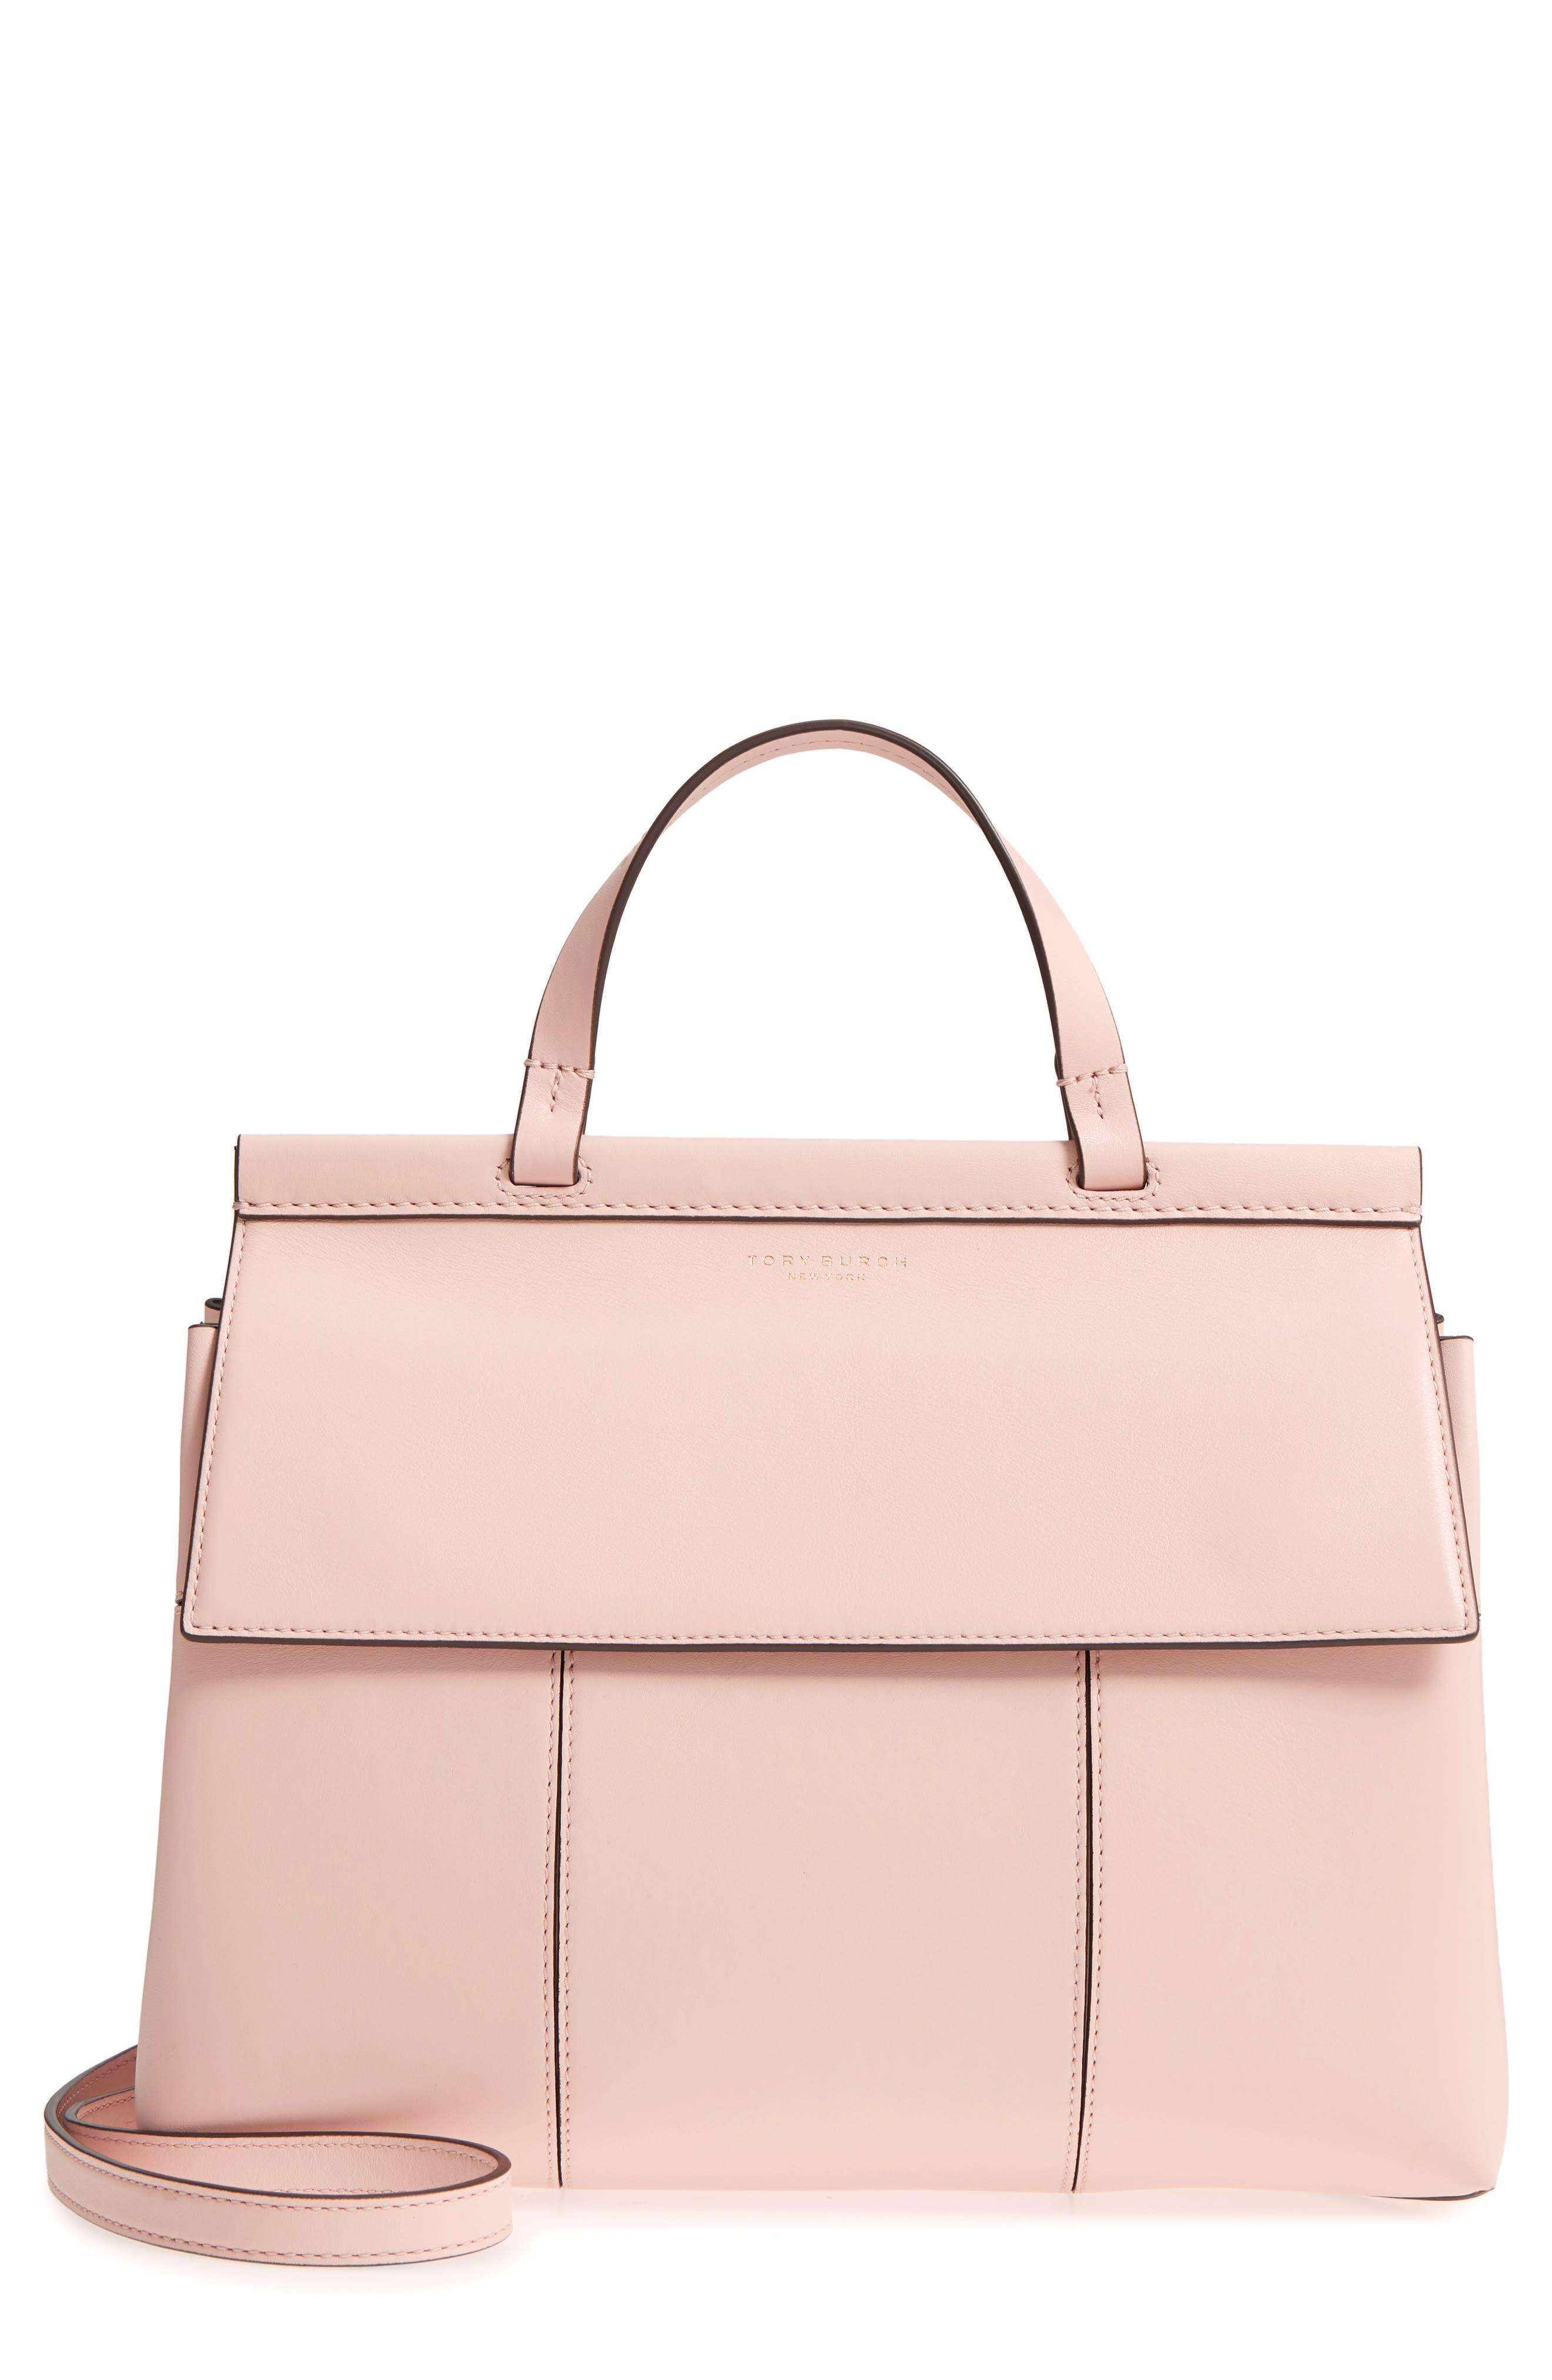 Block T Leather Top Handle Satchel,                             Main thumbnail 1, color,                             Shell Pink/ Goan Sand